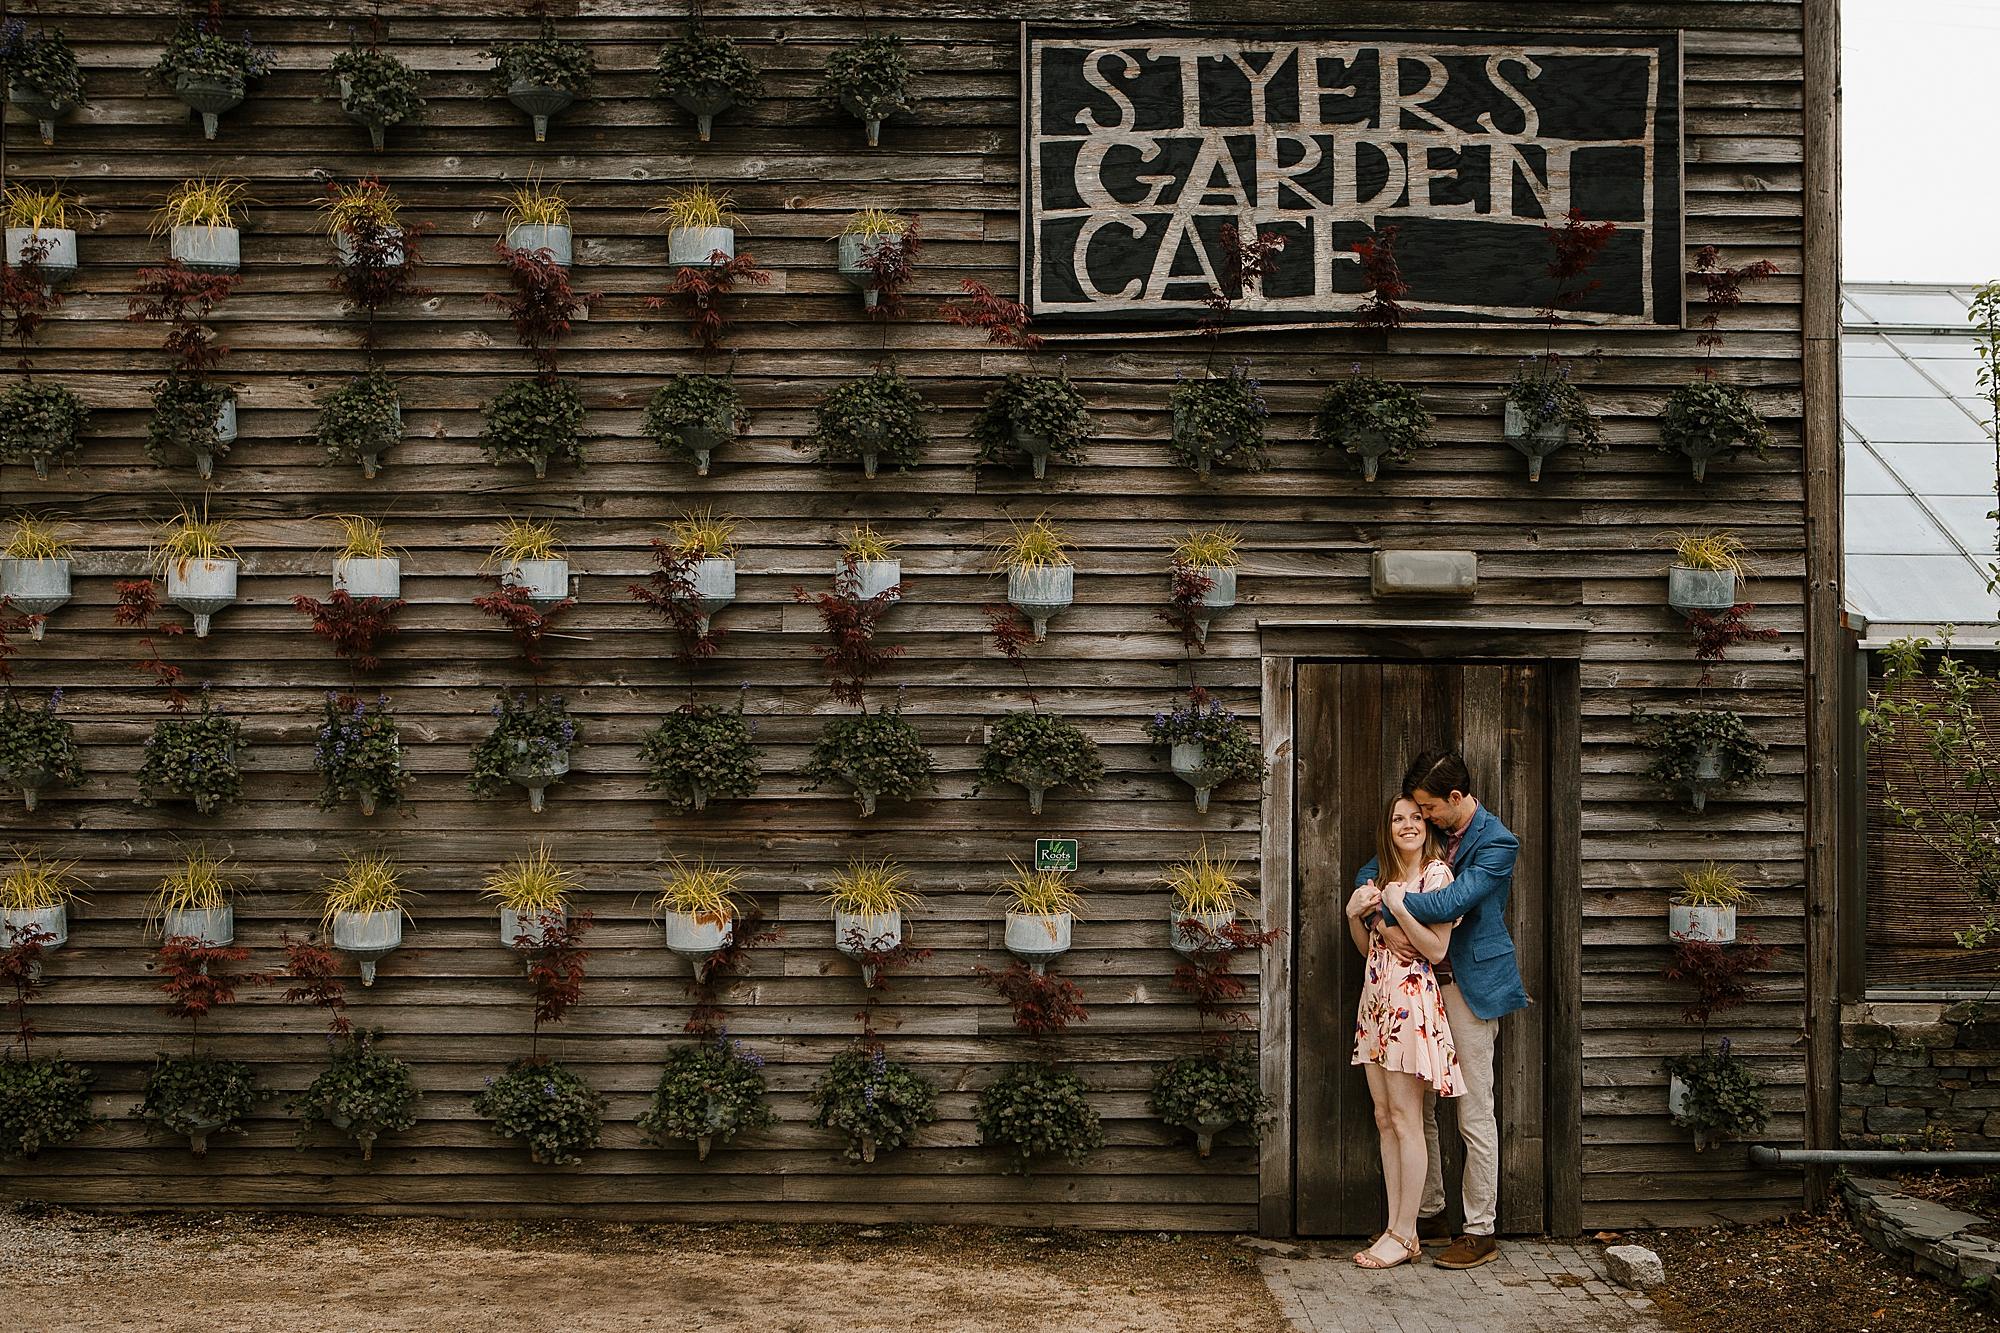 Tori_Zack_Glen_Mills_Terrain Cafe_Wedding_Engagement_Photography_Joe_Mac_Creative__0019.jpg